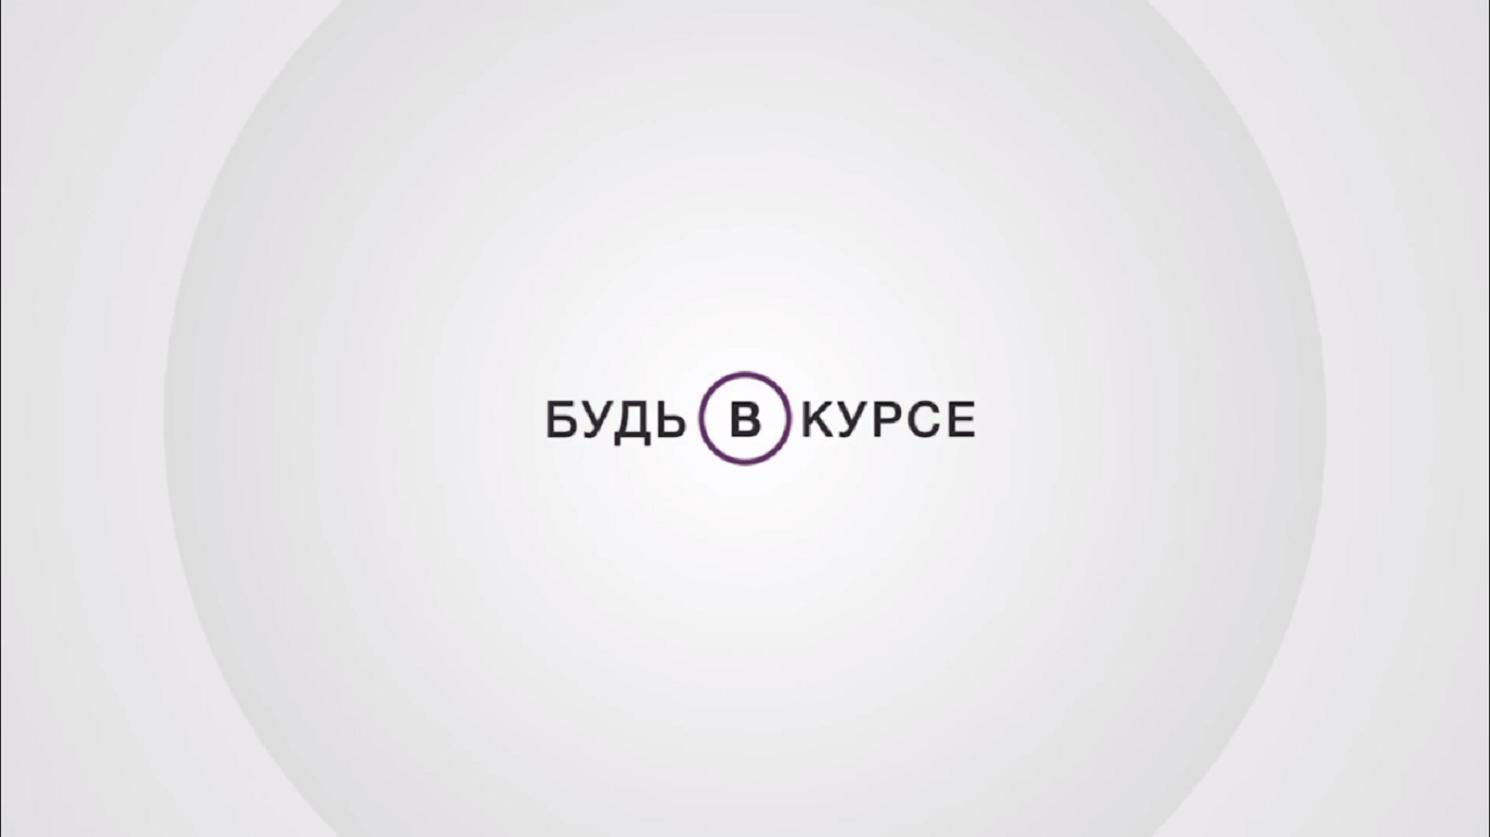 bud1-1250x703-11